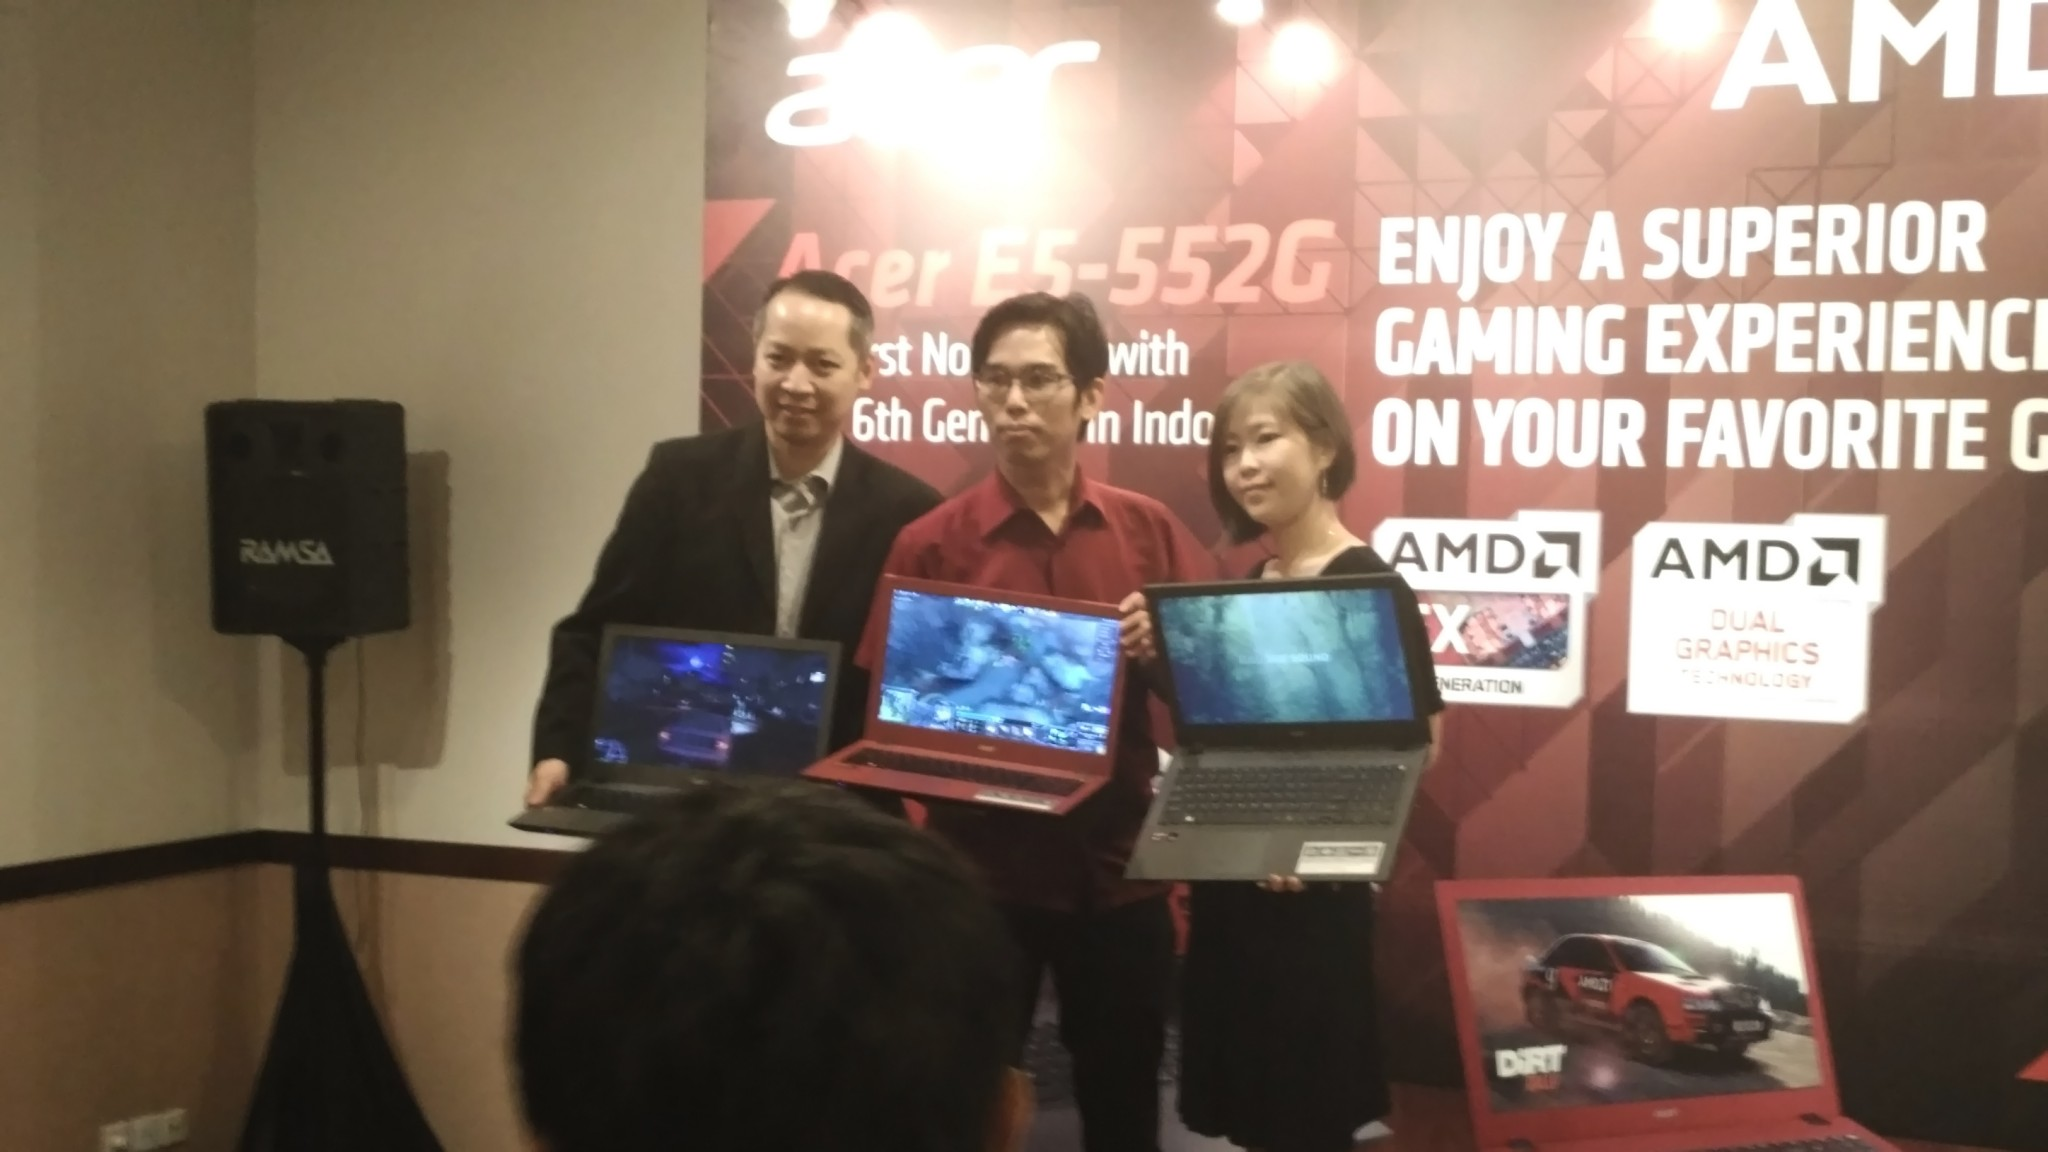 Spesifikasi Acer Aspire E5-552G Carrizo